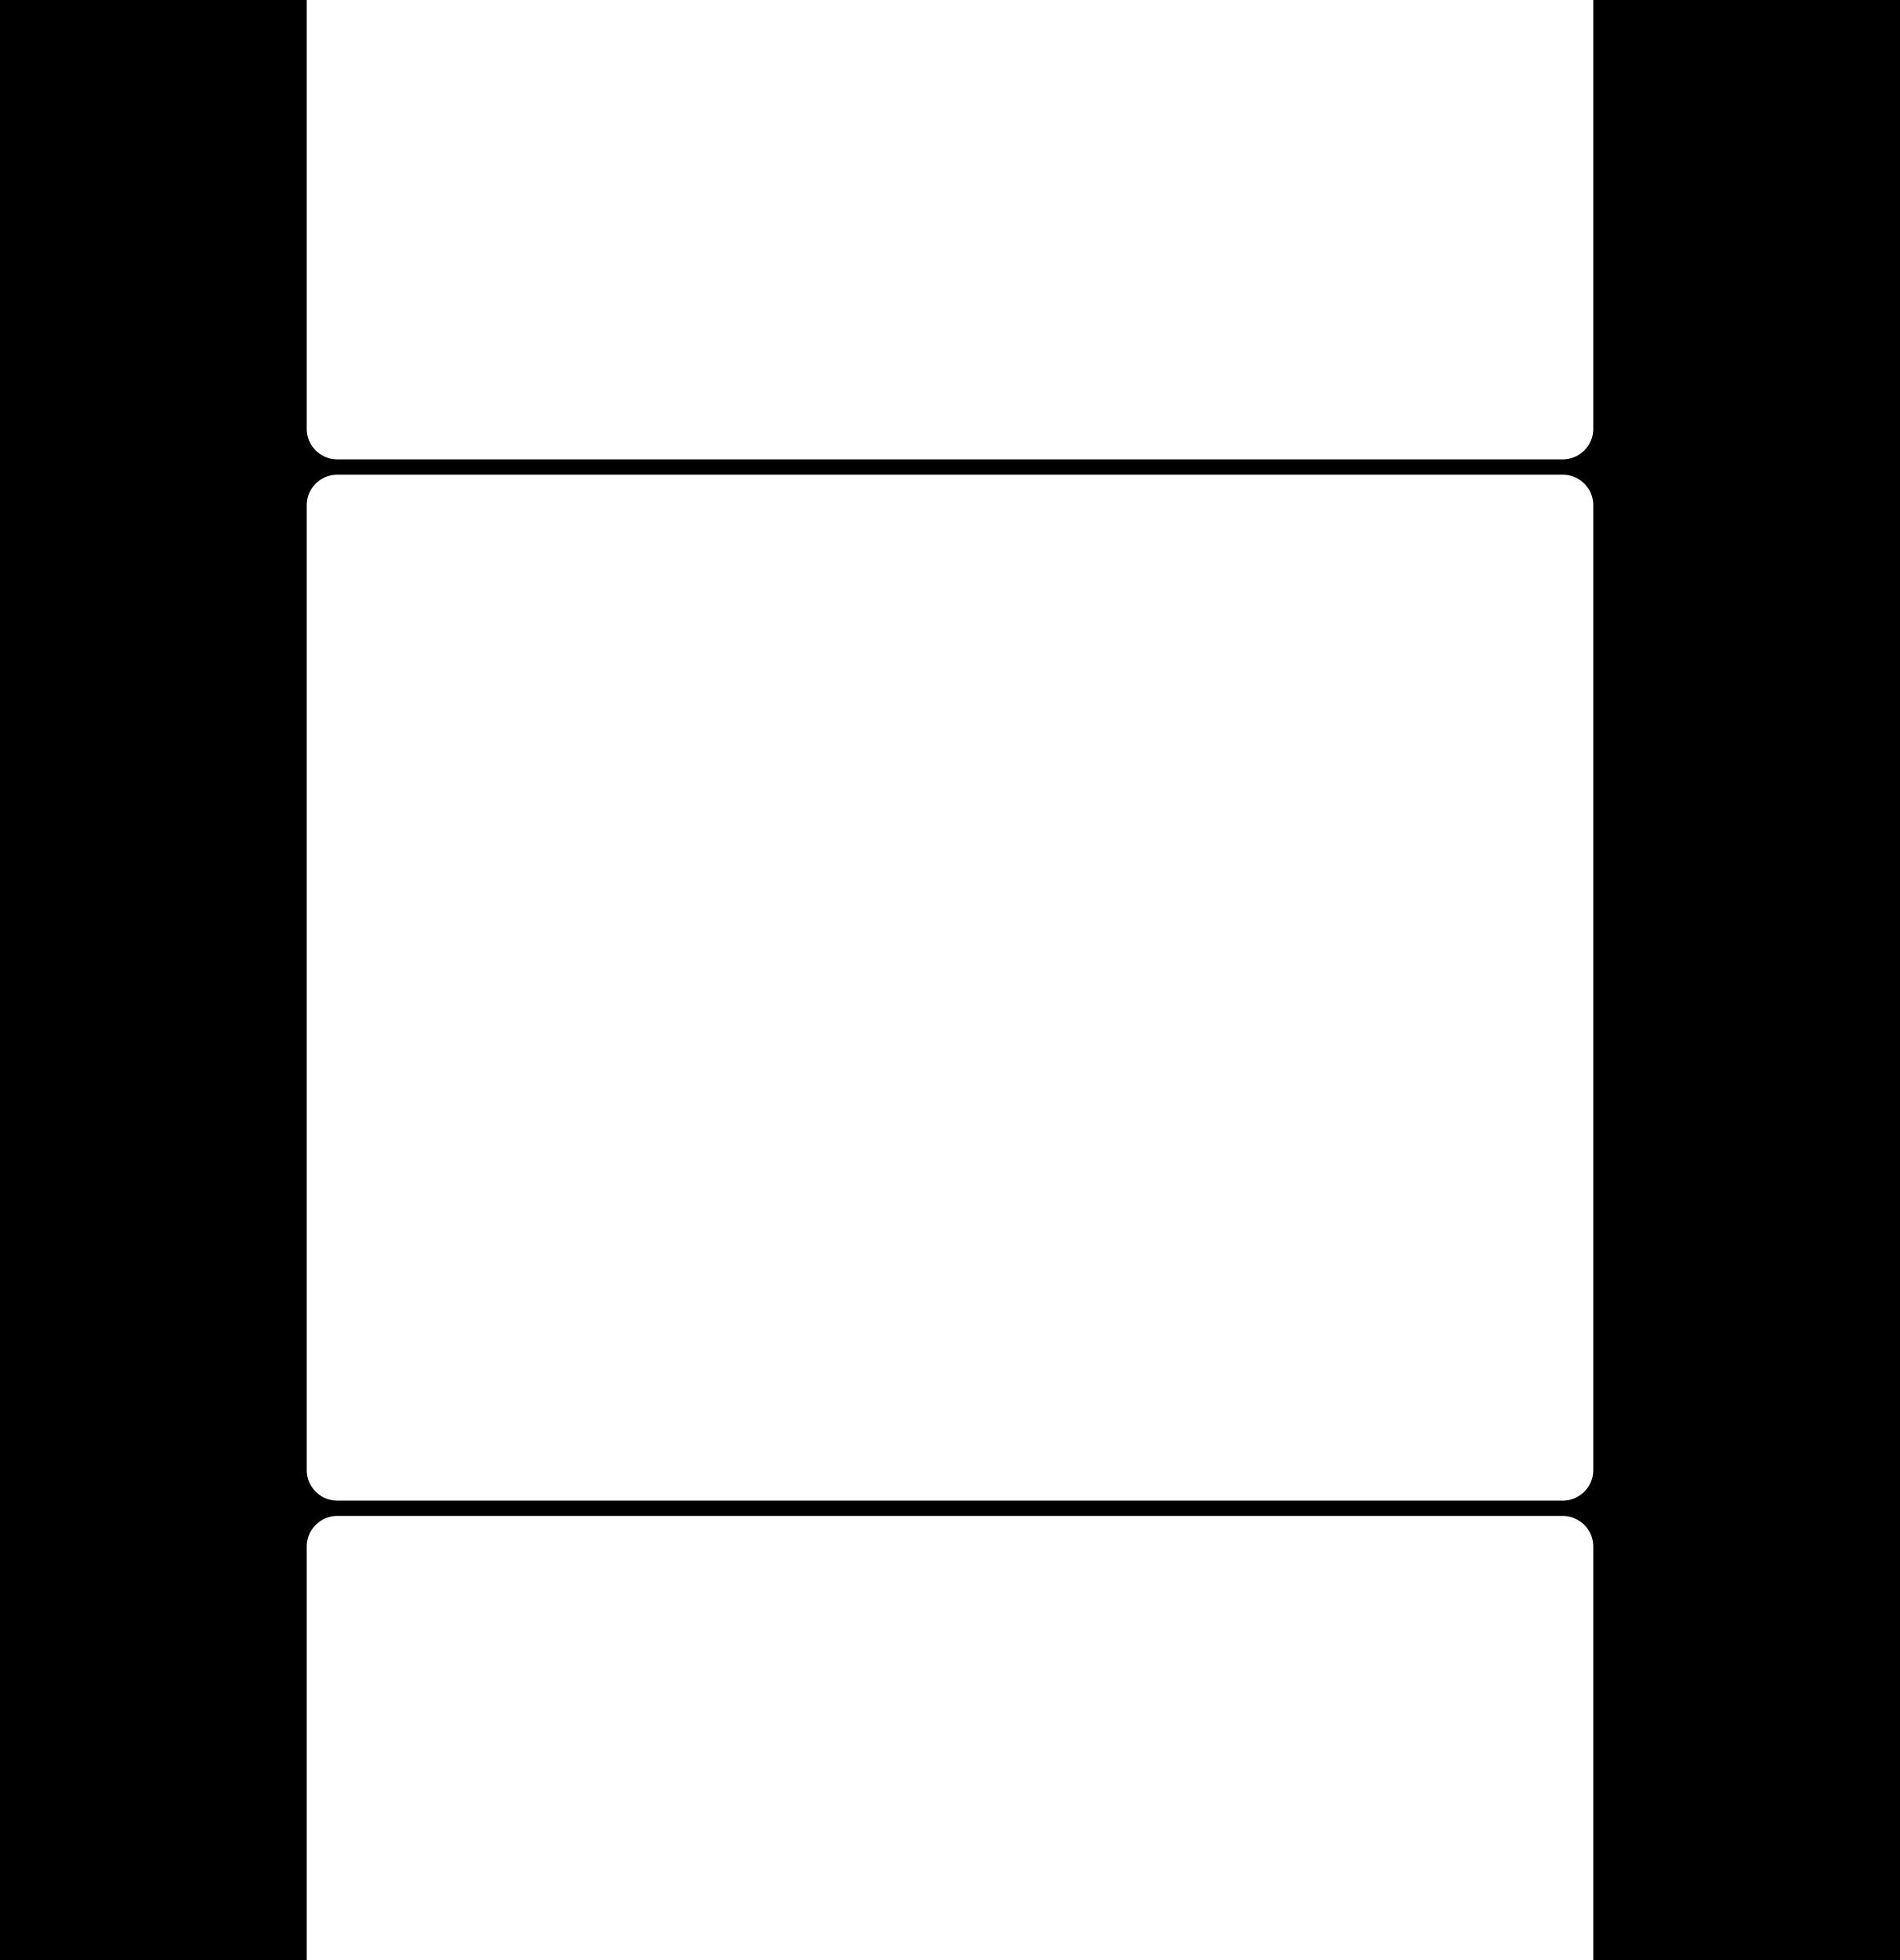 Blank film strip clipart.